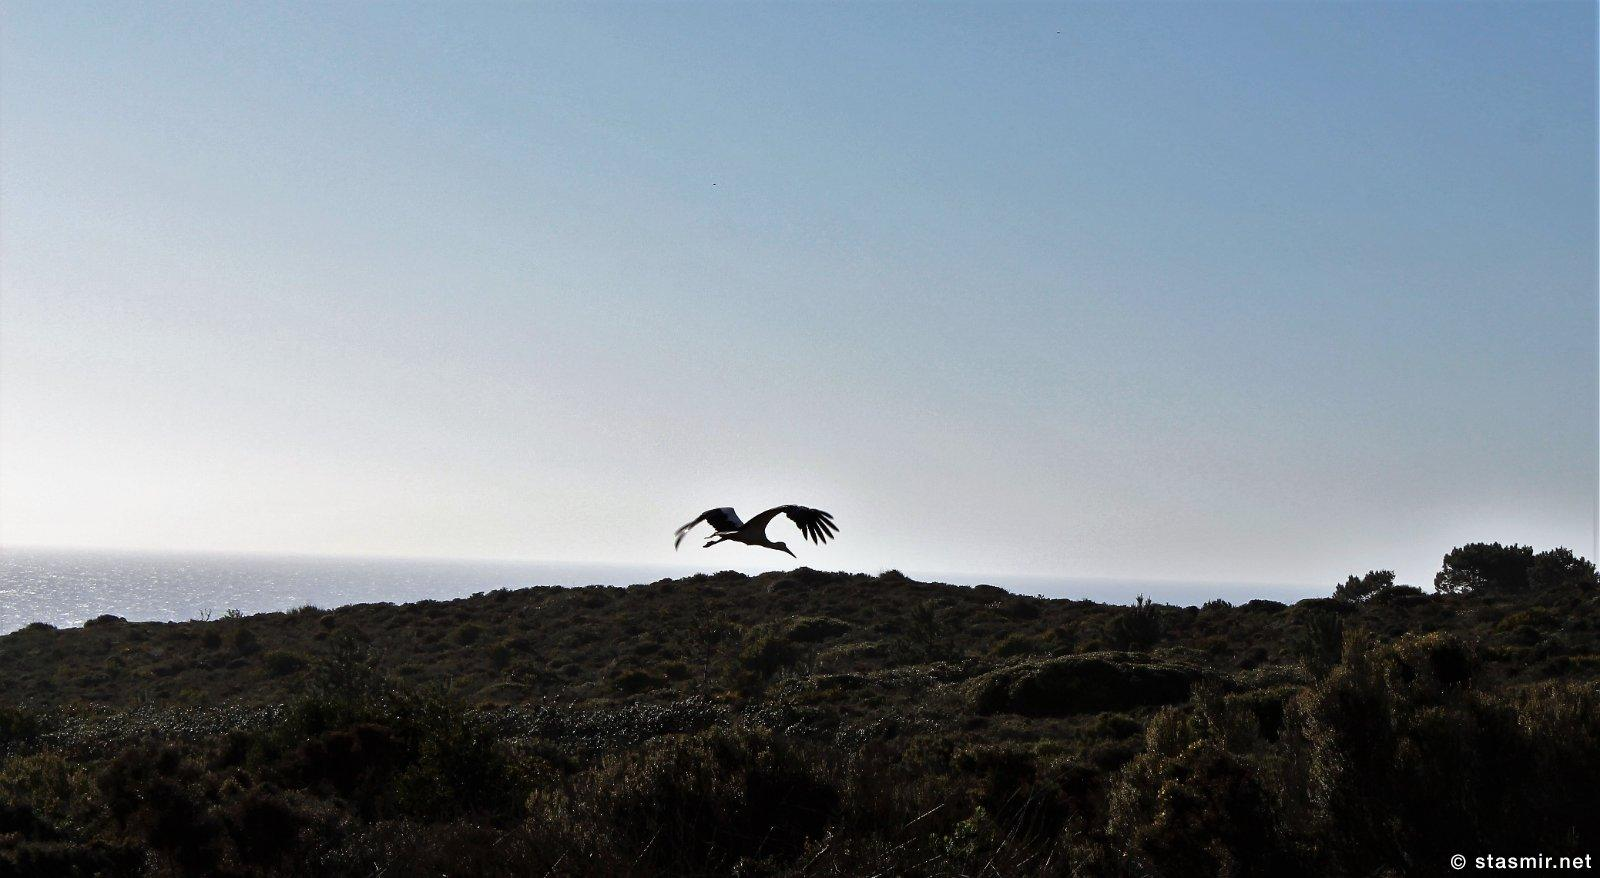 Аист, летящий над Коштой Висентиной на юго-западе Алгарве, Португалия, фото Стасмир, photo Stasmir